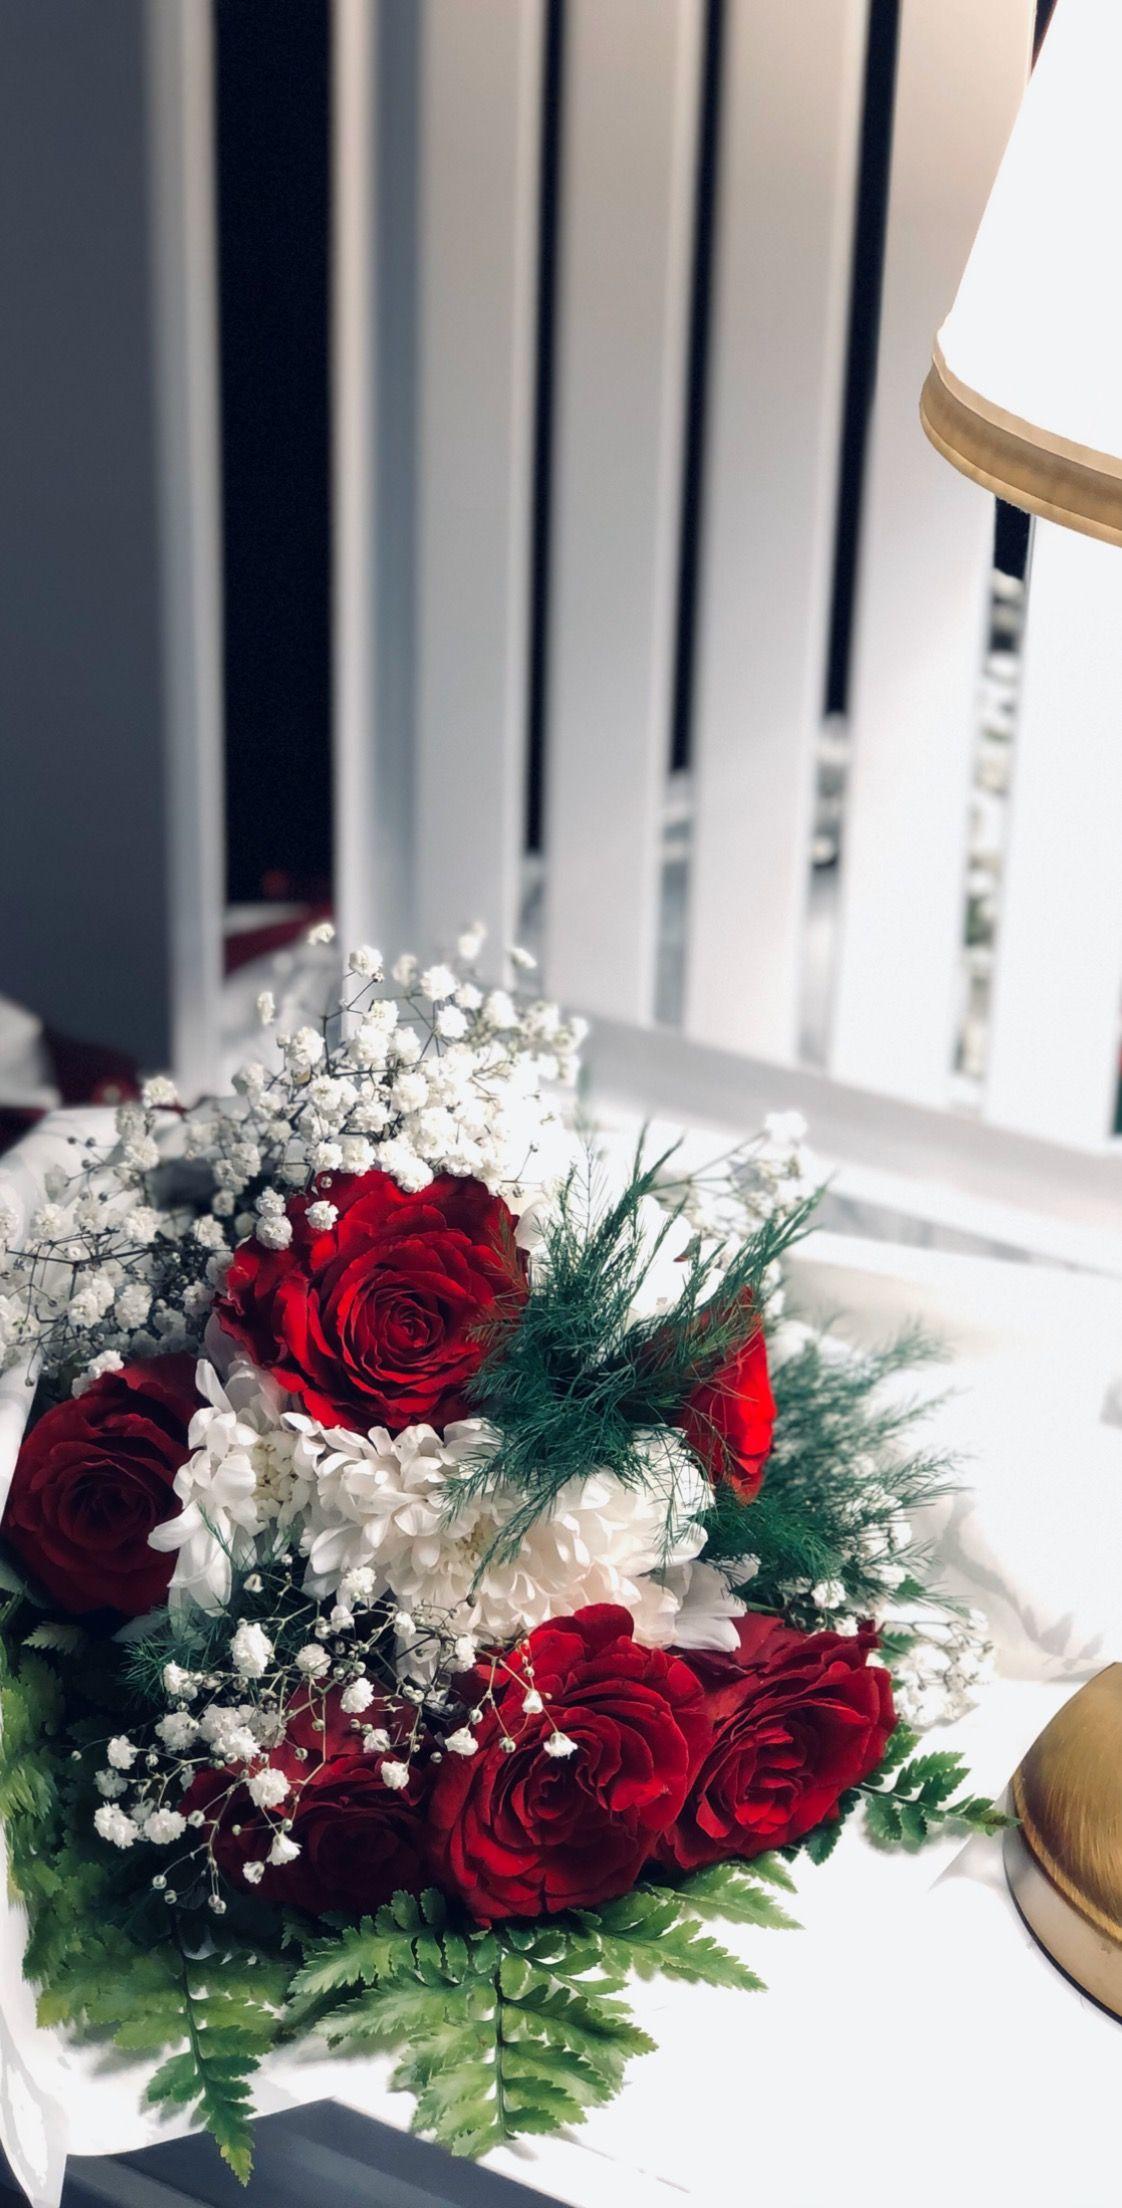 Pin By Samyaa Alshehri On My Photo Holiday Decor Christmas Wreaths Holiday